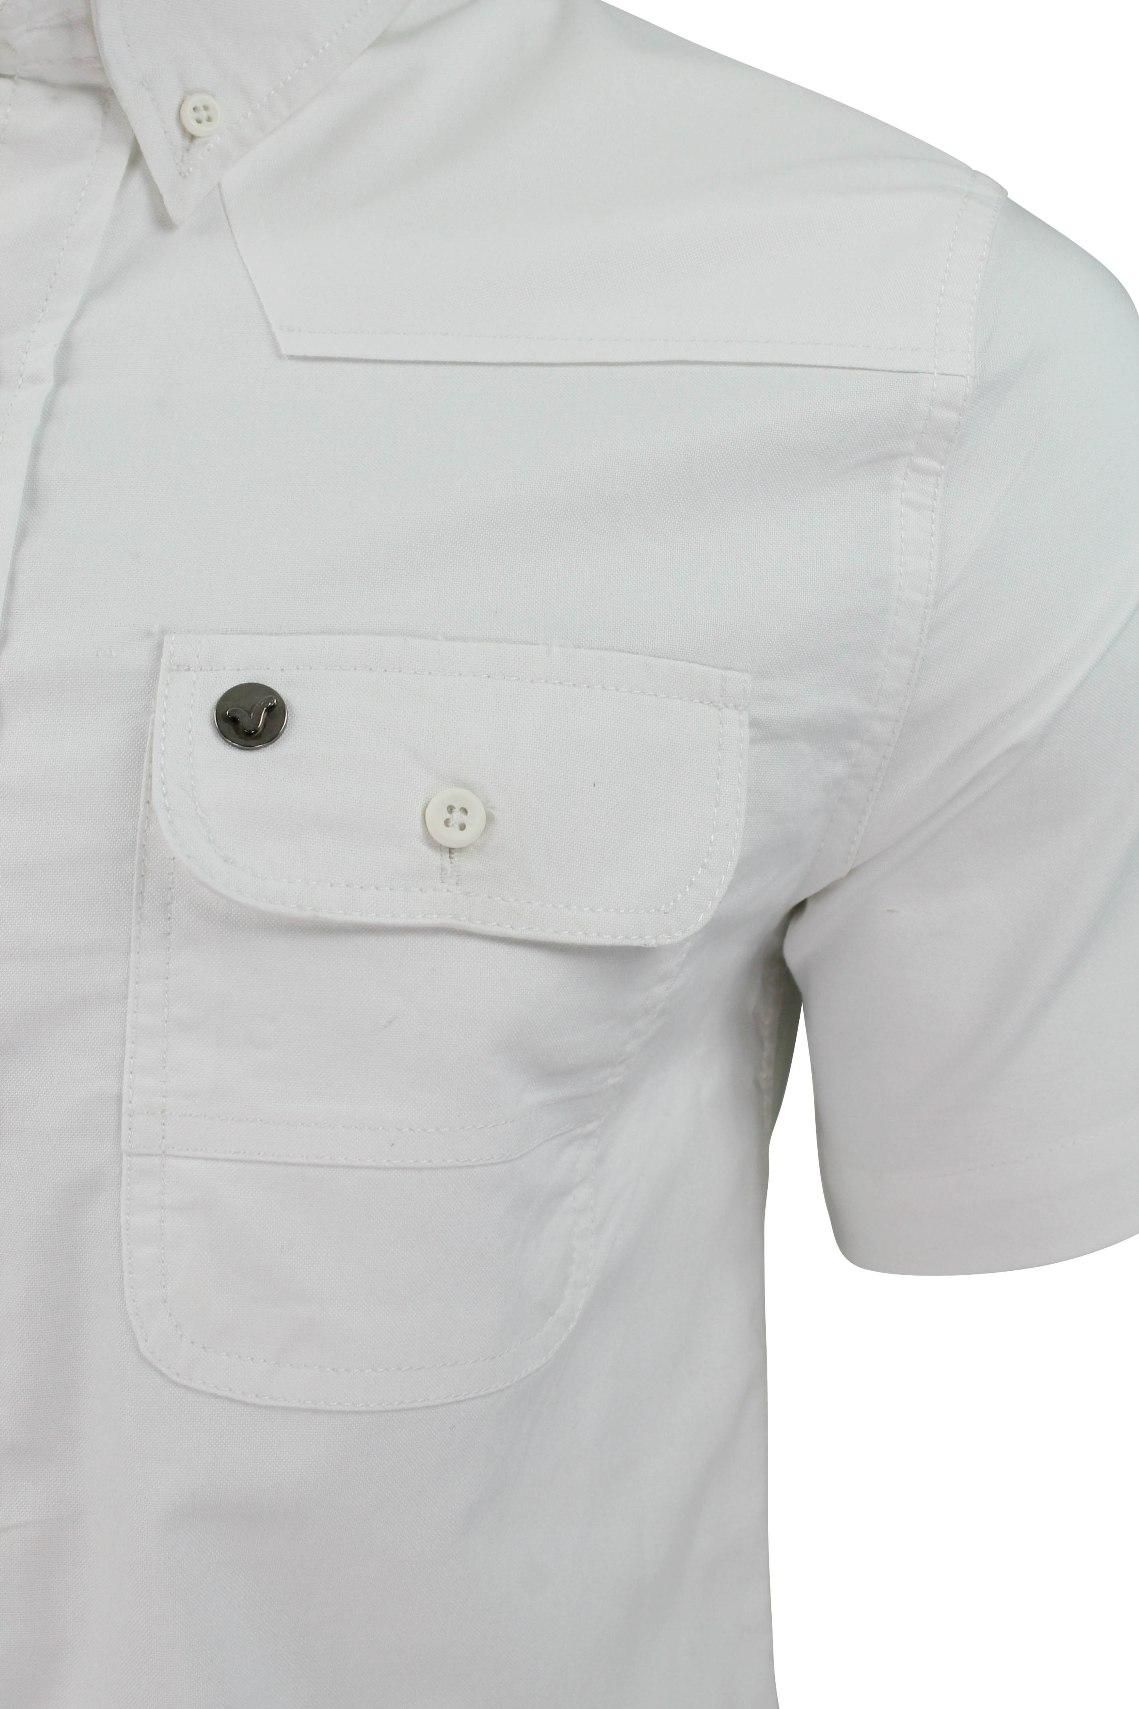 Mens Shirt by Voi Jeans /'Burke/' Short Sleeved